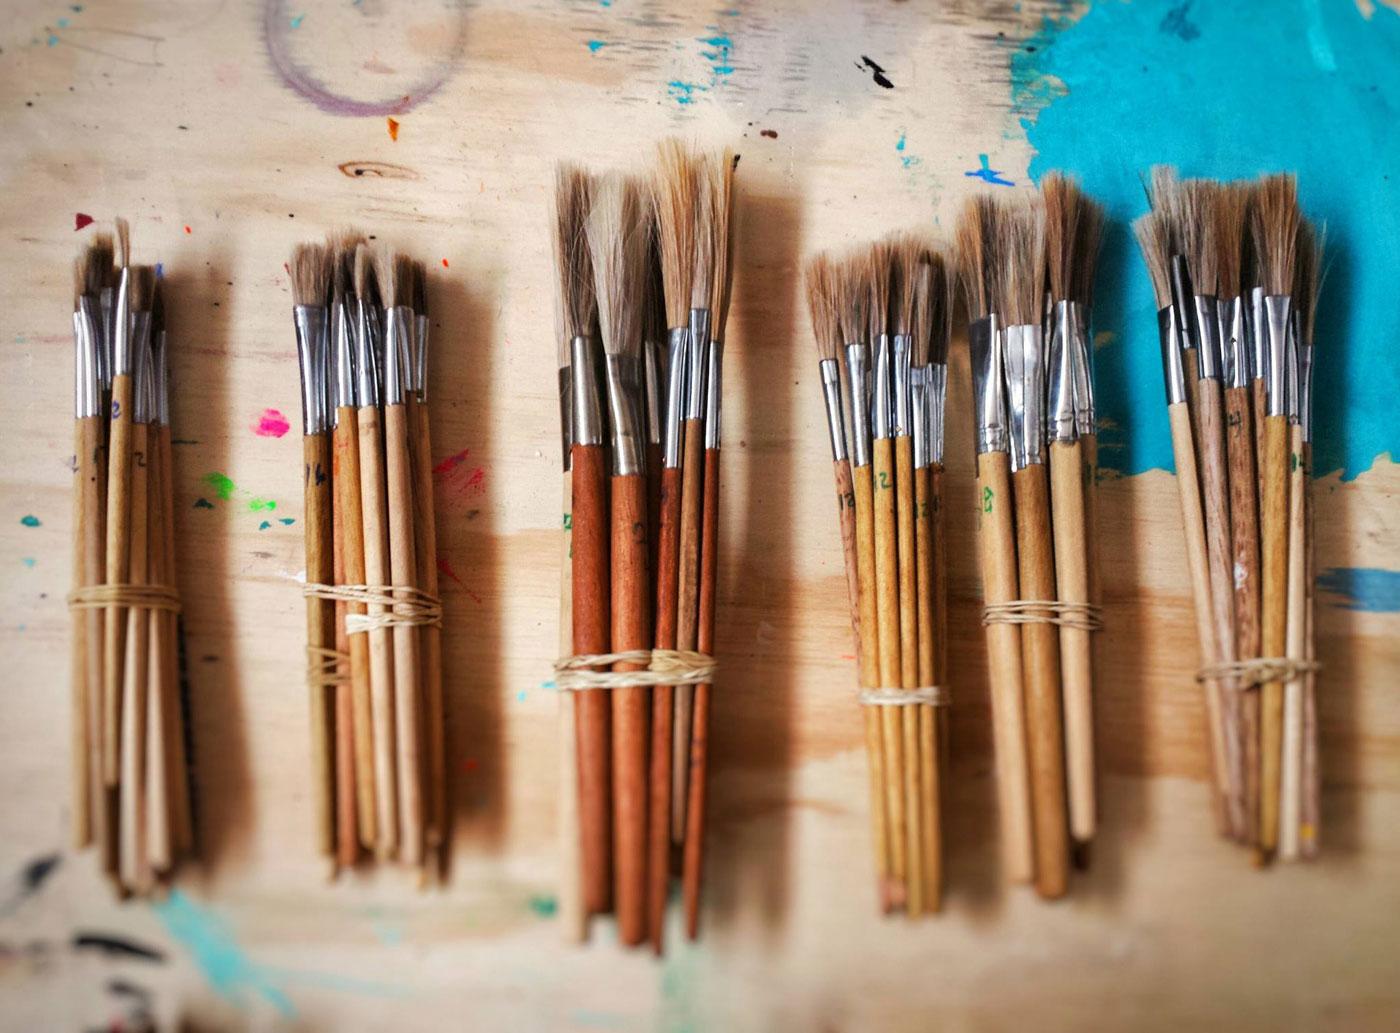 Brushes by Carga Máxima